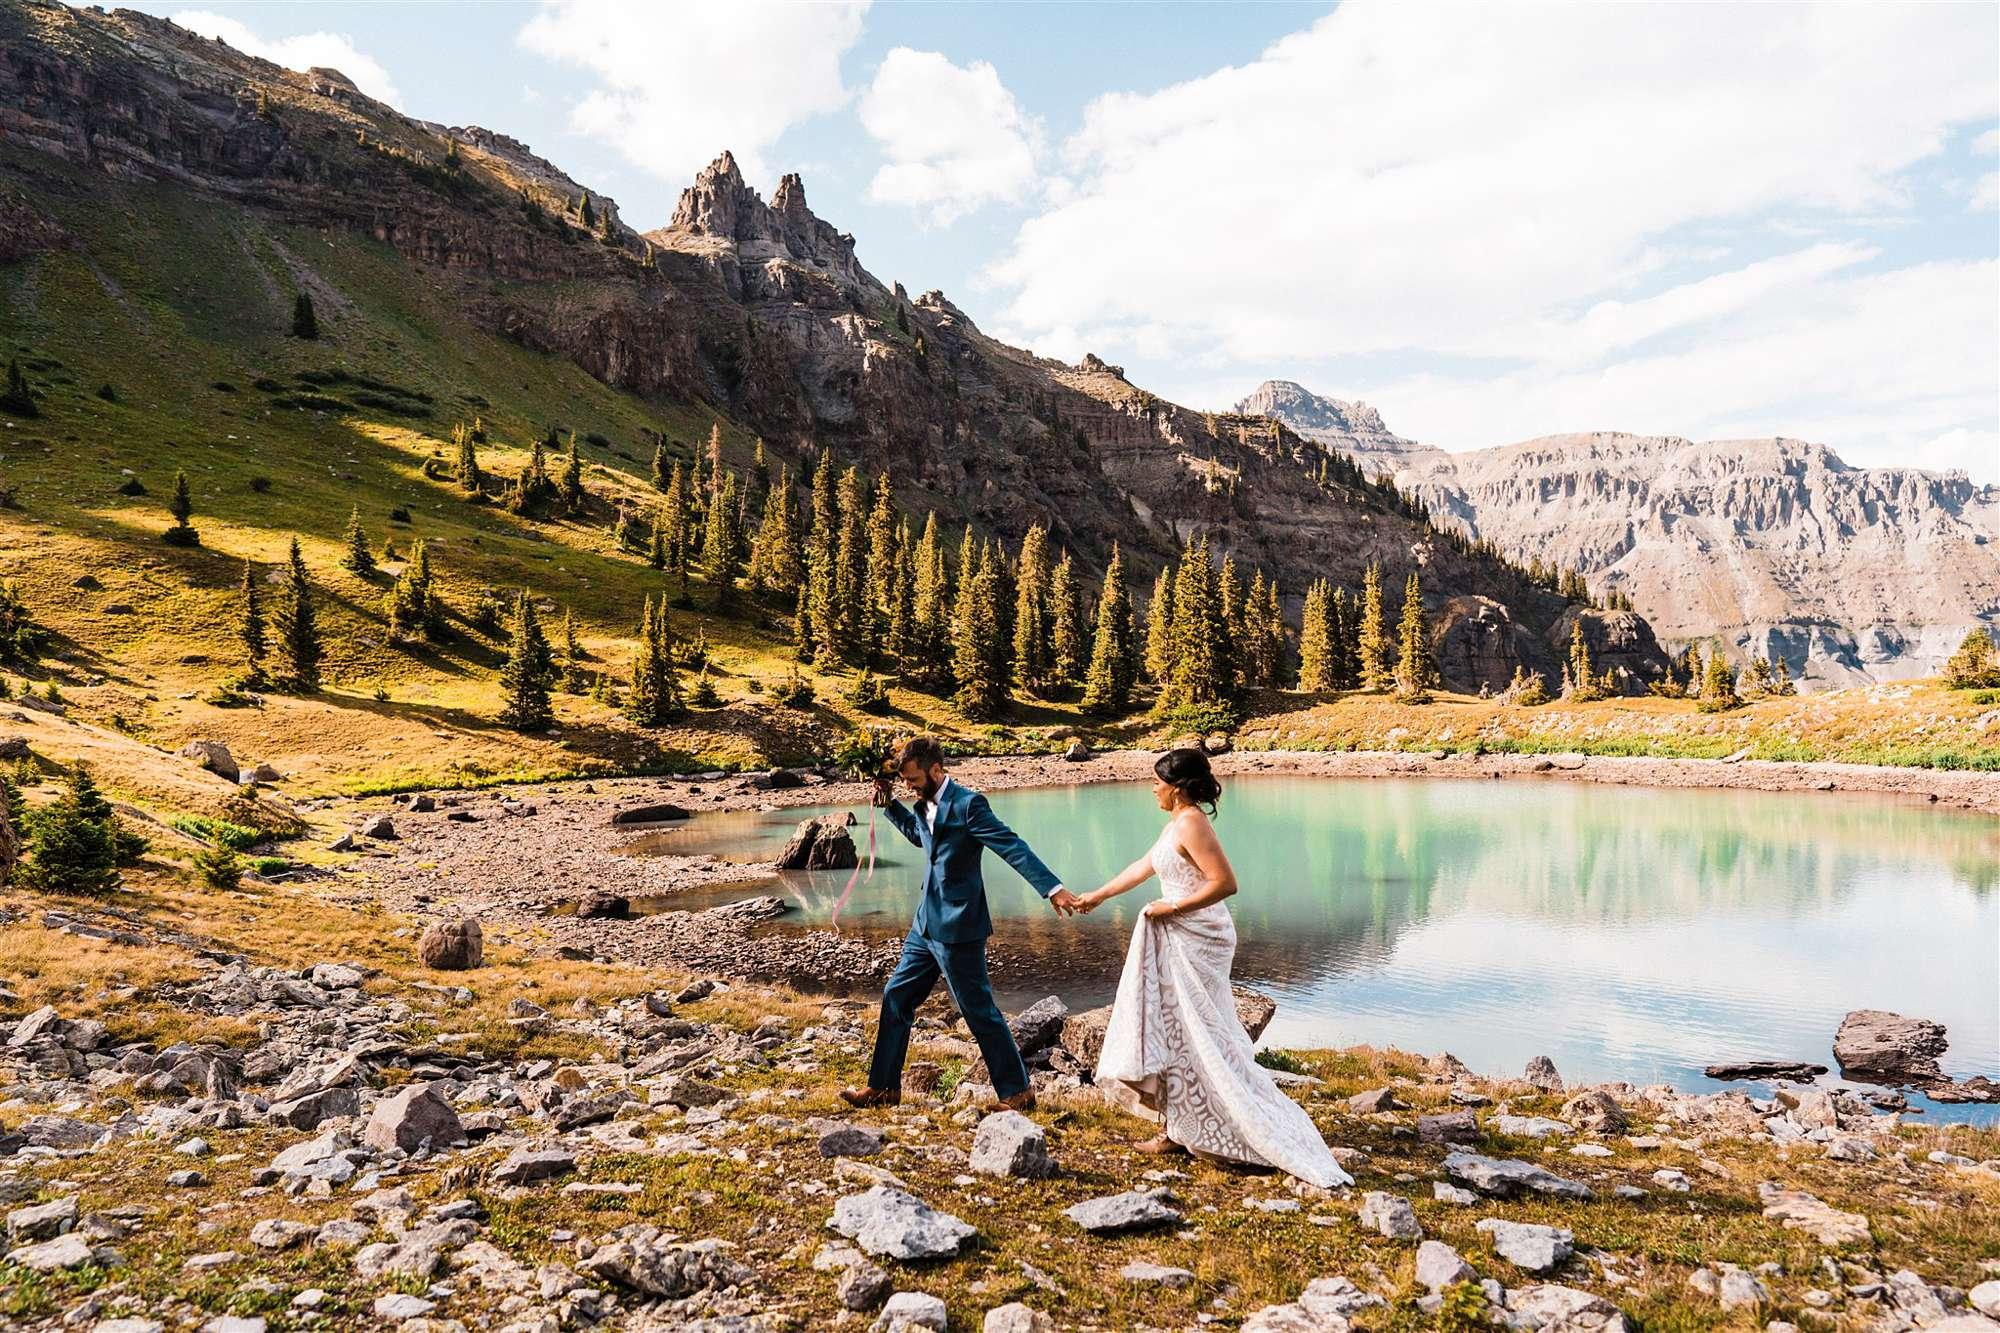 Colorado_Jeeping_Elopement_Emily_Matt_The_Foxes_Photography_0021.jpg